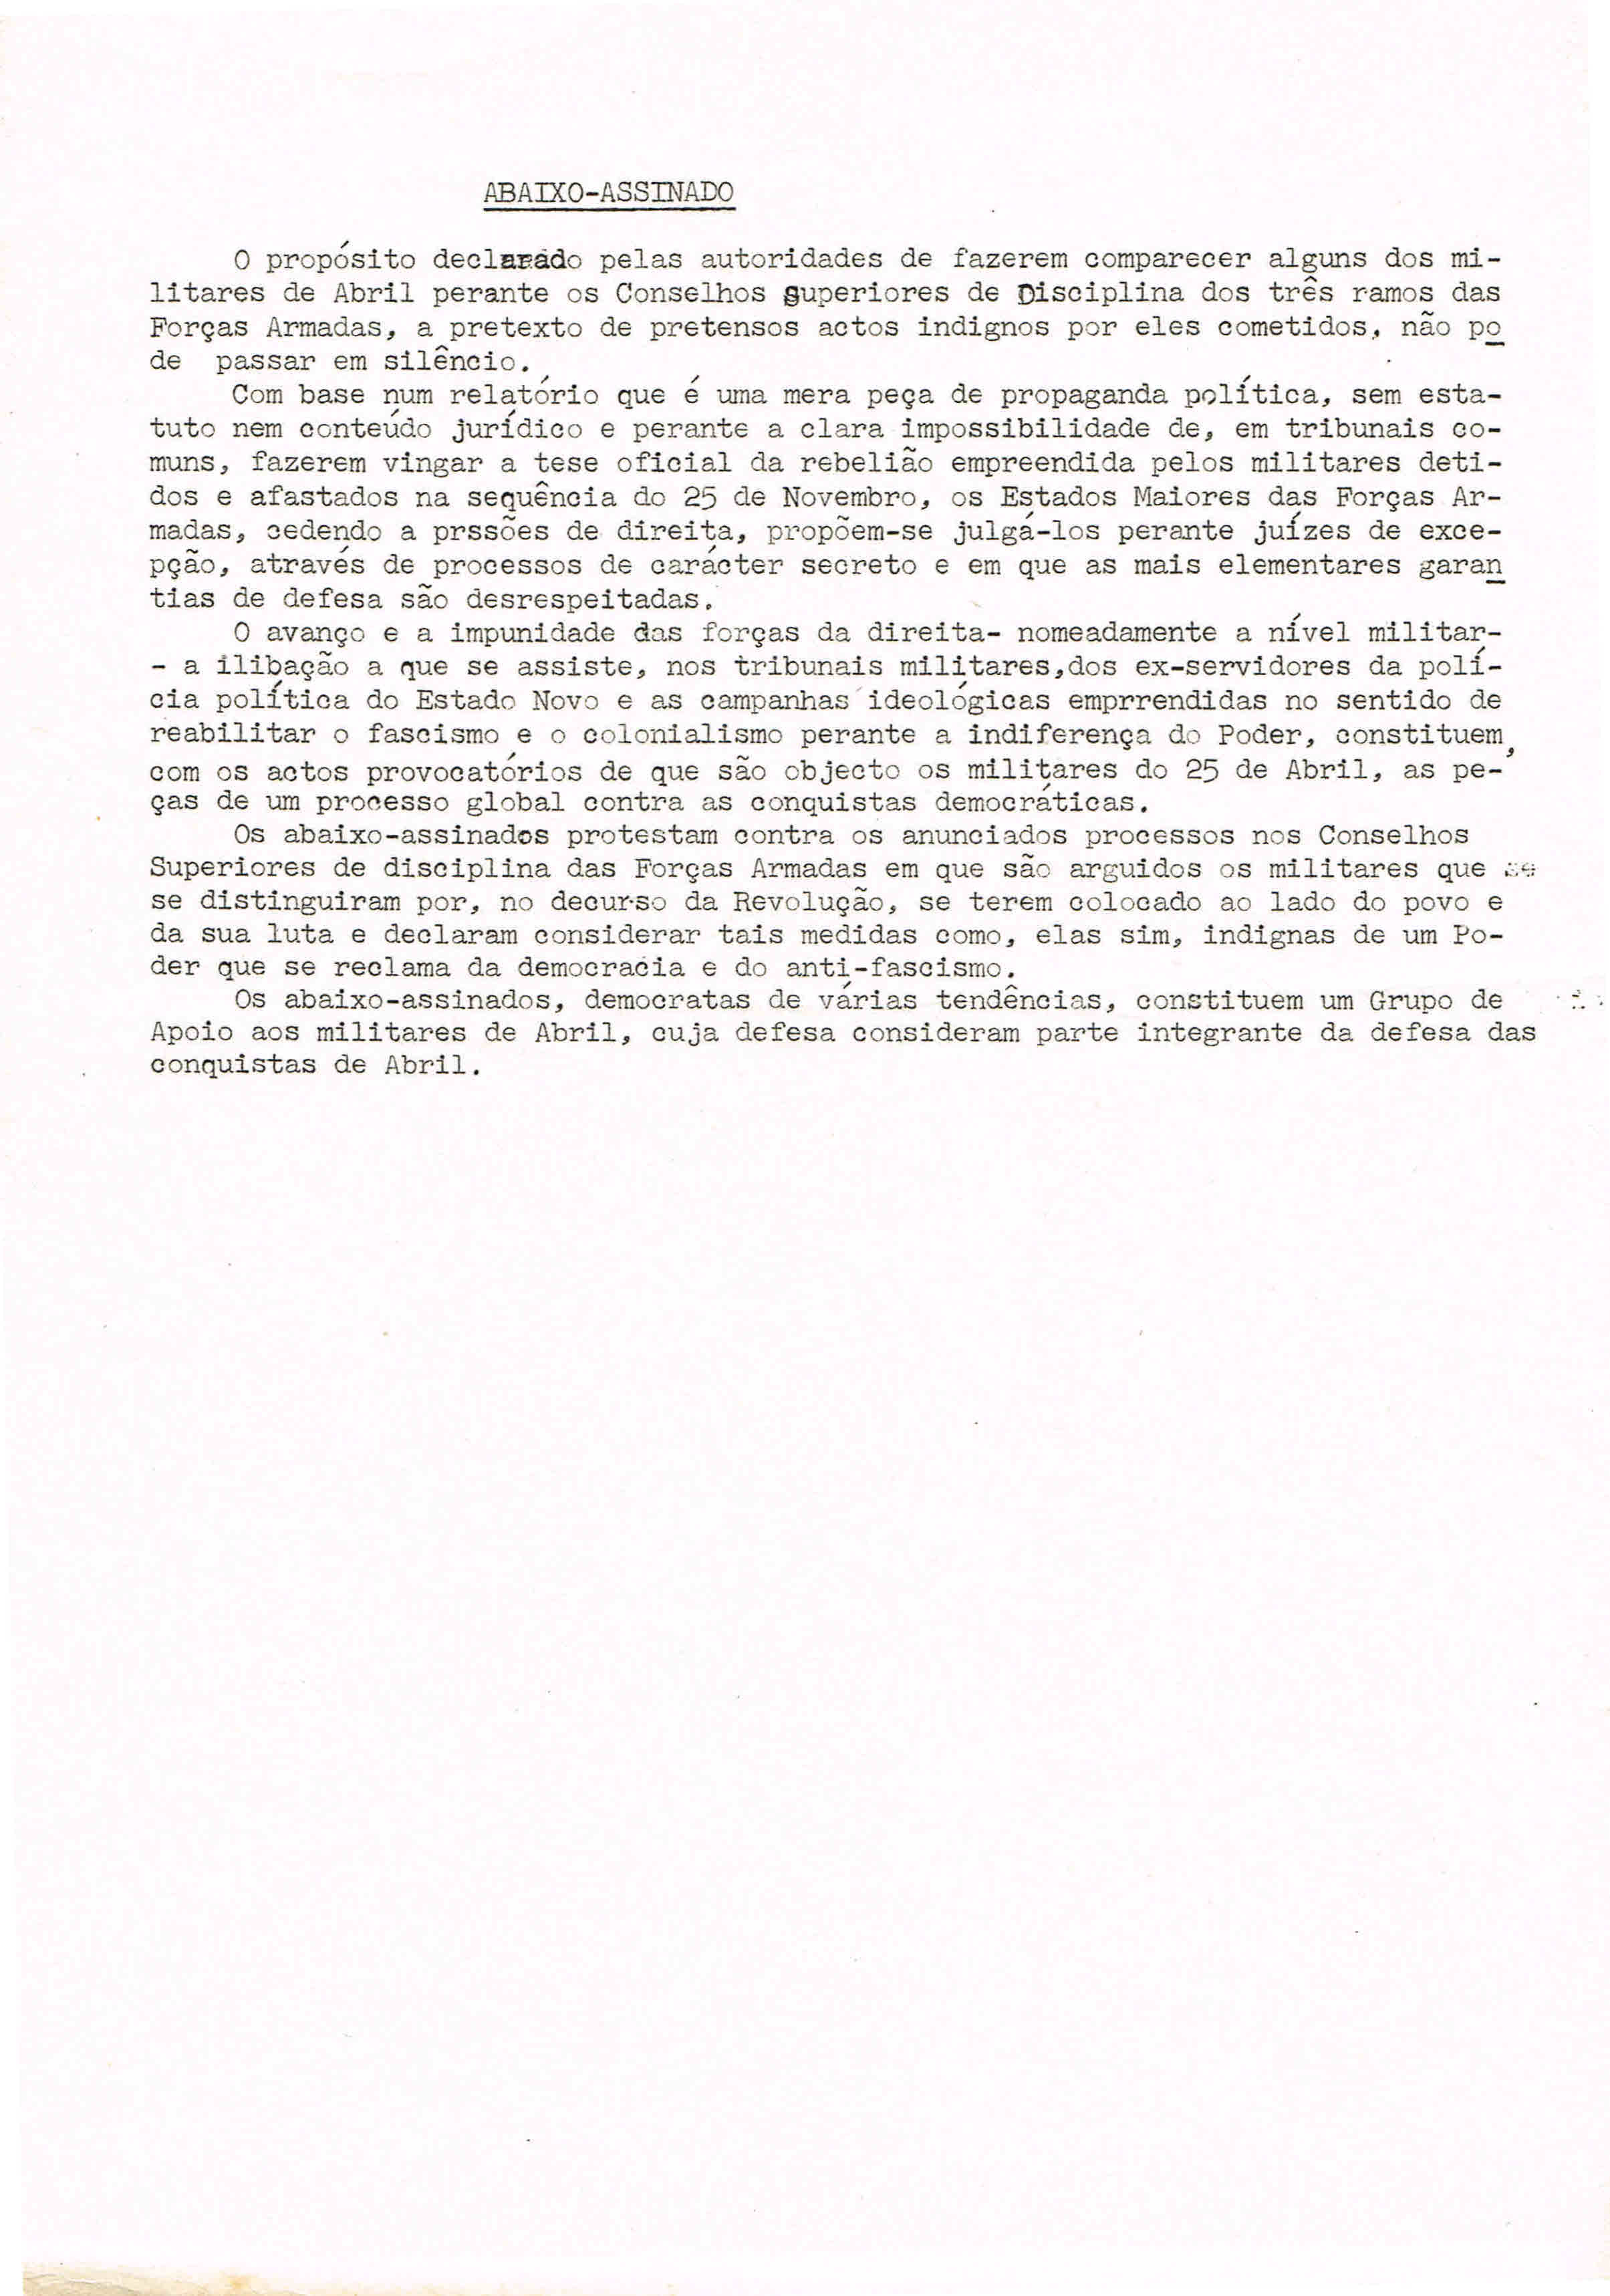 CCF17052017F (5)